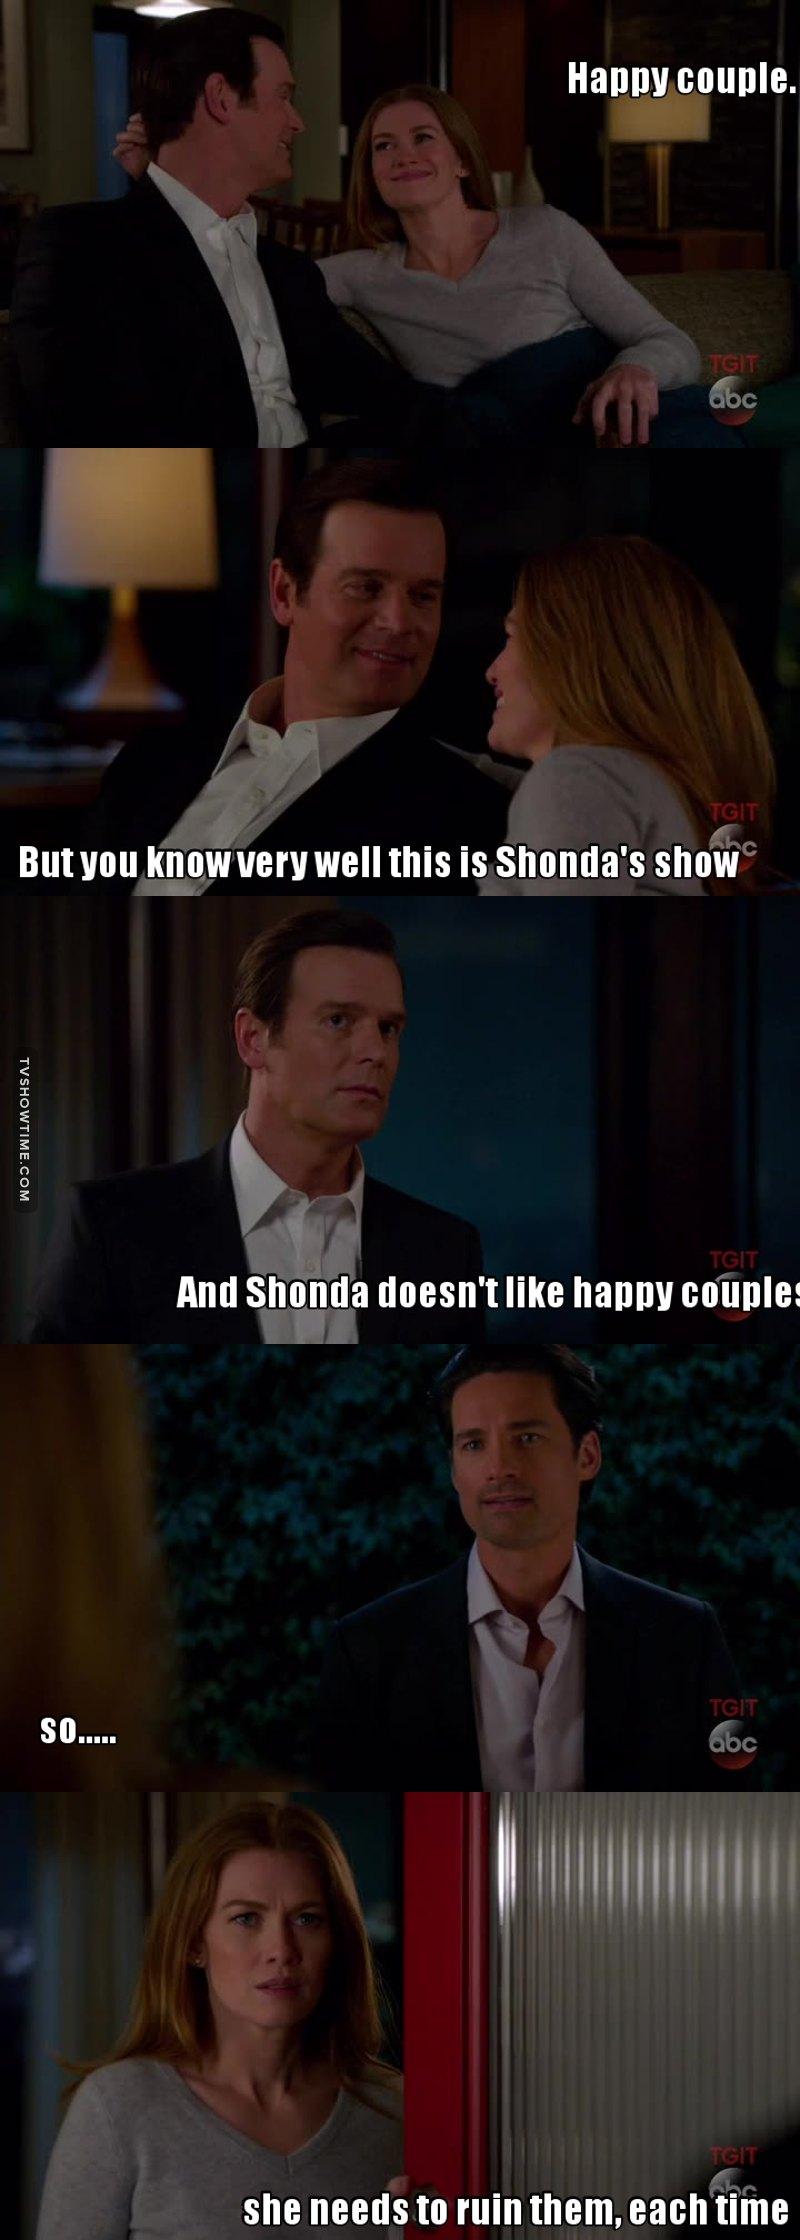 Shonda probably got some problems...